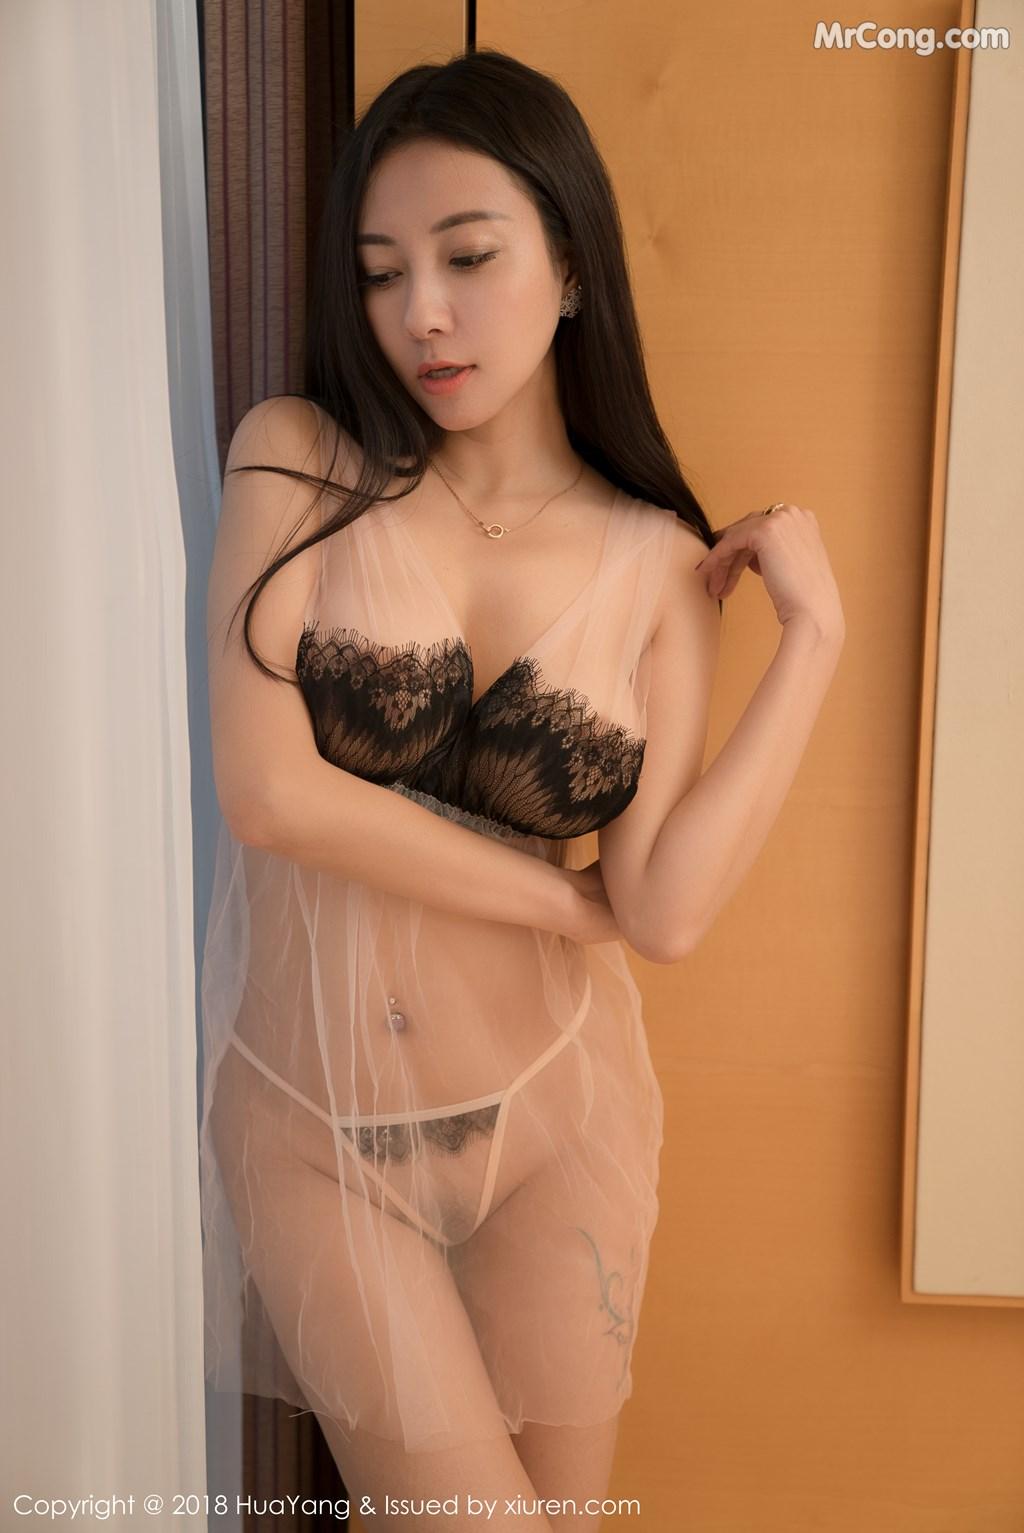 Image HuaYang-2018-01-26-Vol.028-Victoria-Guo-Er-MrCong.com-007 in post HuaYang 2018-01-26 Vol.028: Người mẫu Victoria (果儿) (41 ảnh)